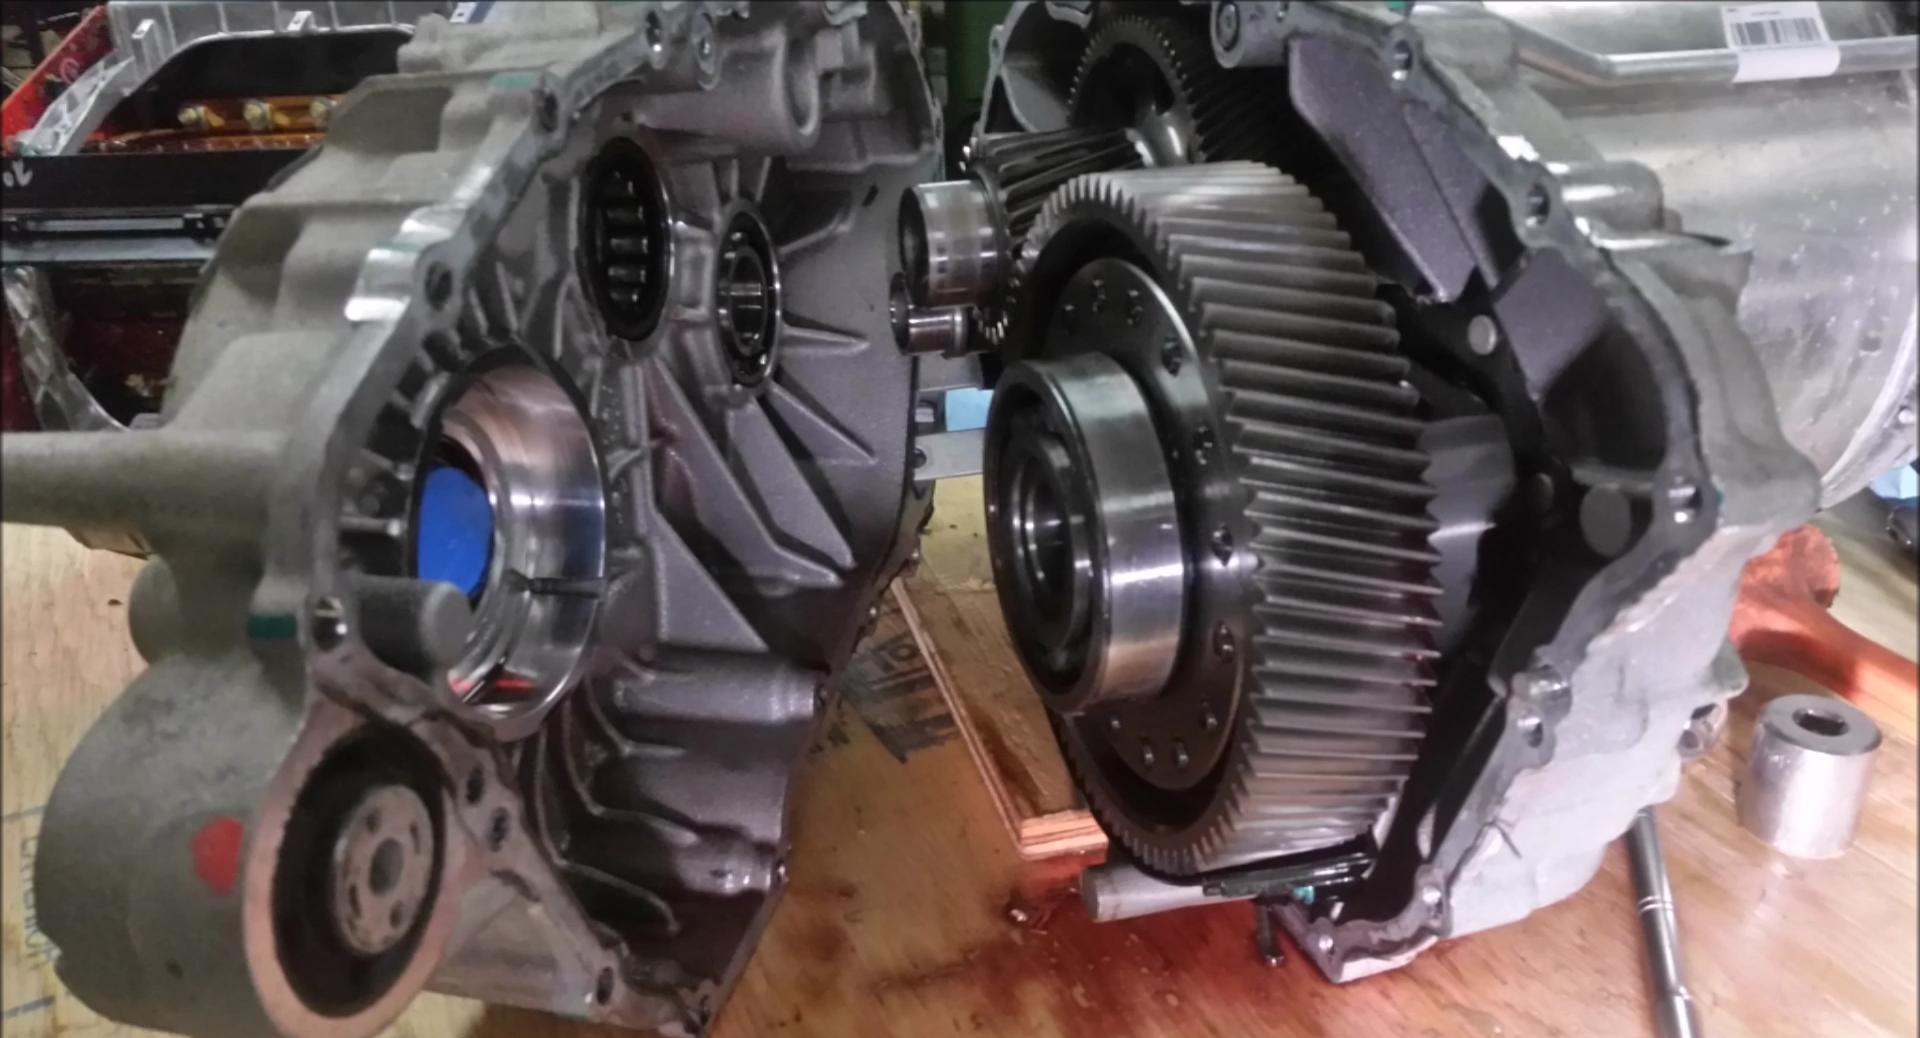 A Clic 427 Shelby Cobra Ed By Tesla Electric Motor Kia Soul Ev Battery Pack Electrek